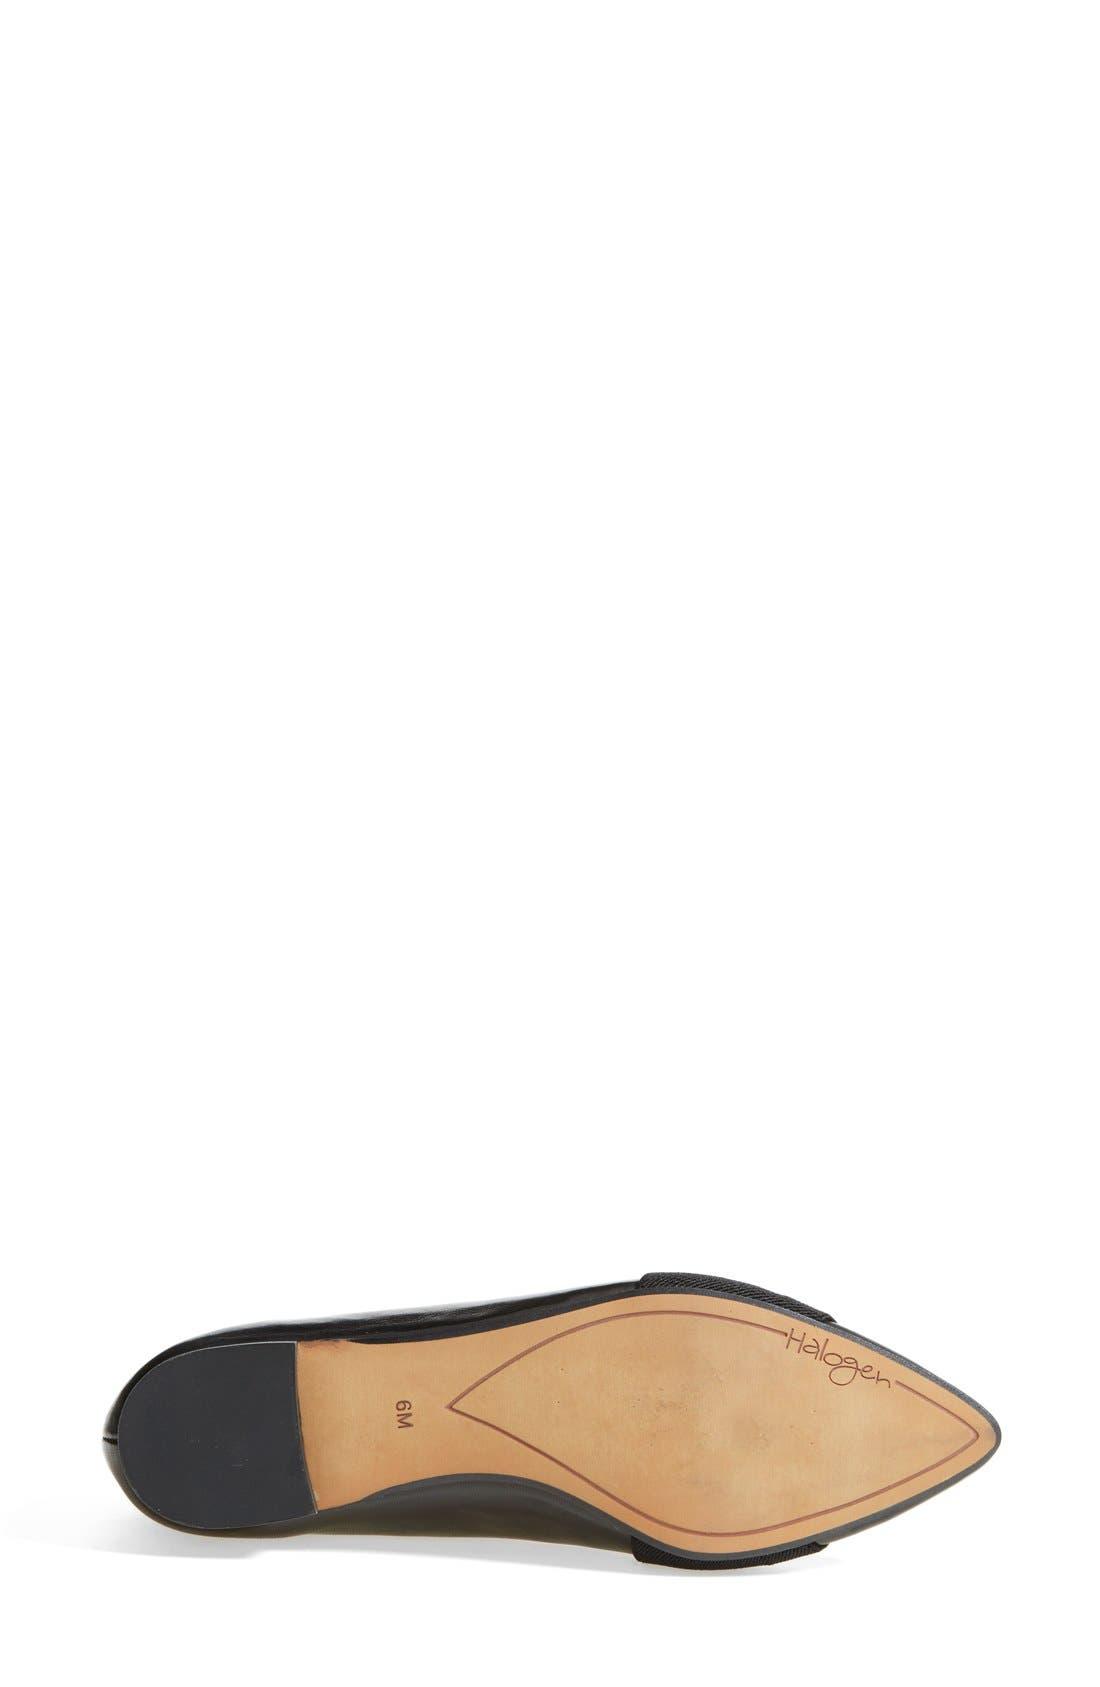 'Leah' Leather Flat,                             Alternate thumbnail 2, color,                             001